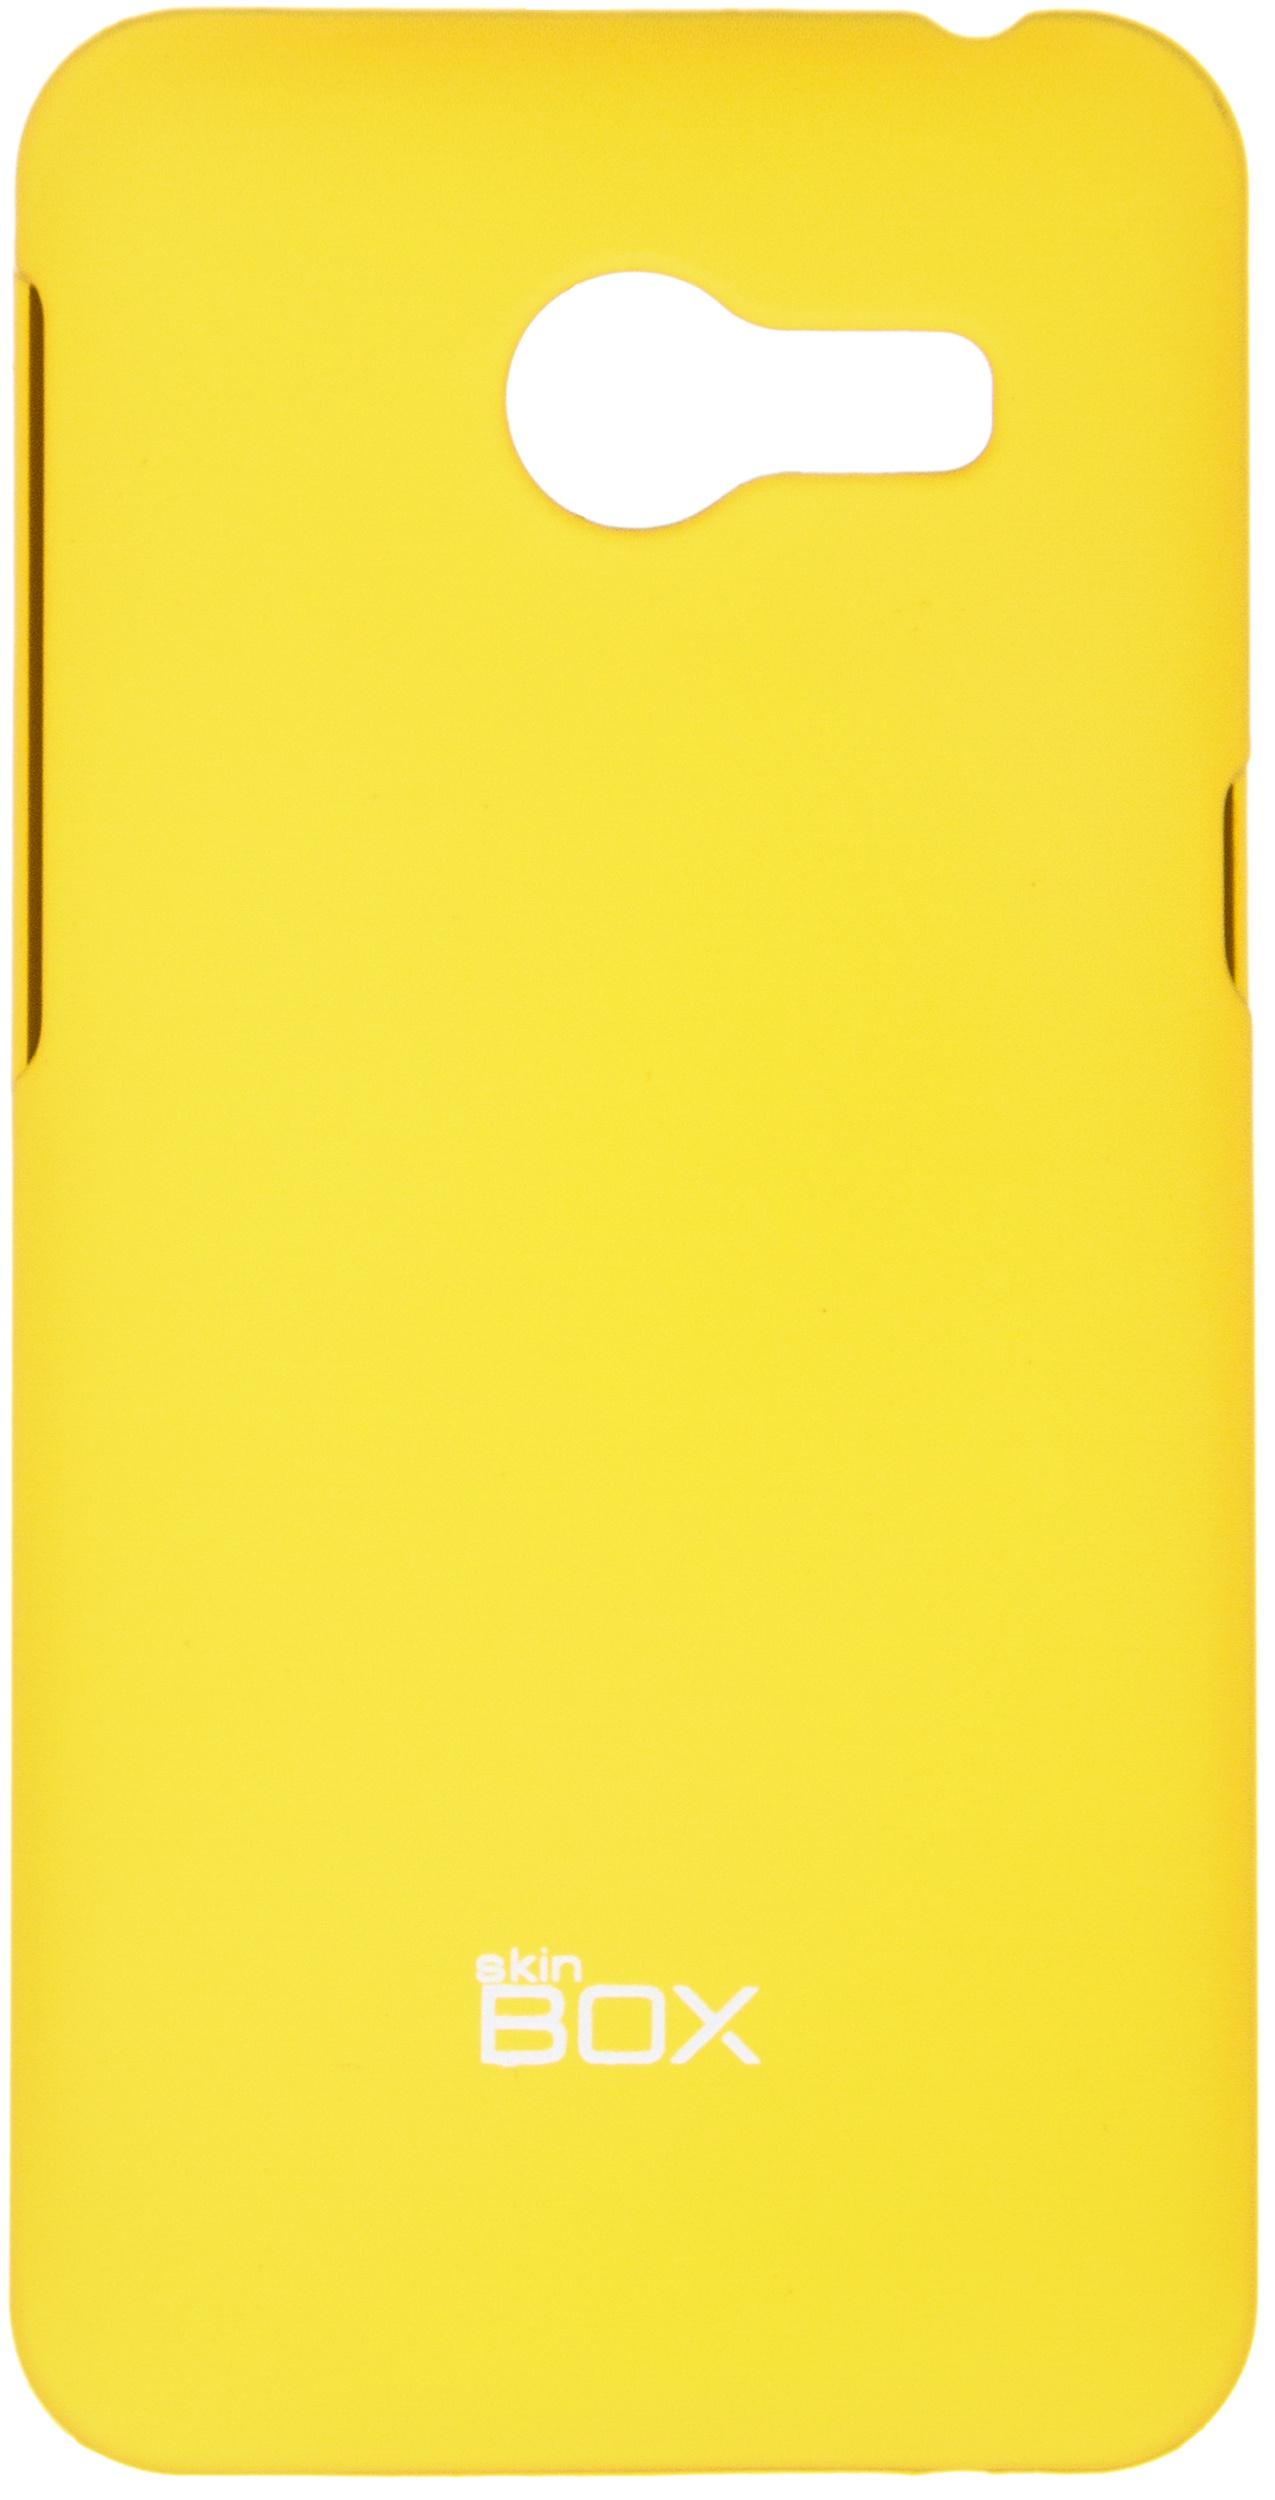 Чехол для сотового телефона skinBOX 4People, 4630042526488, желтый чехол для сотового телефона skinbox 4people 4630042526730 желтый